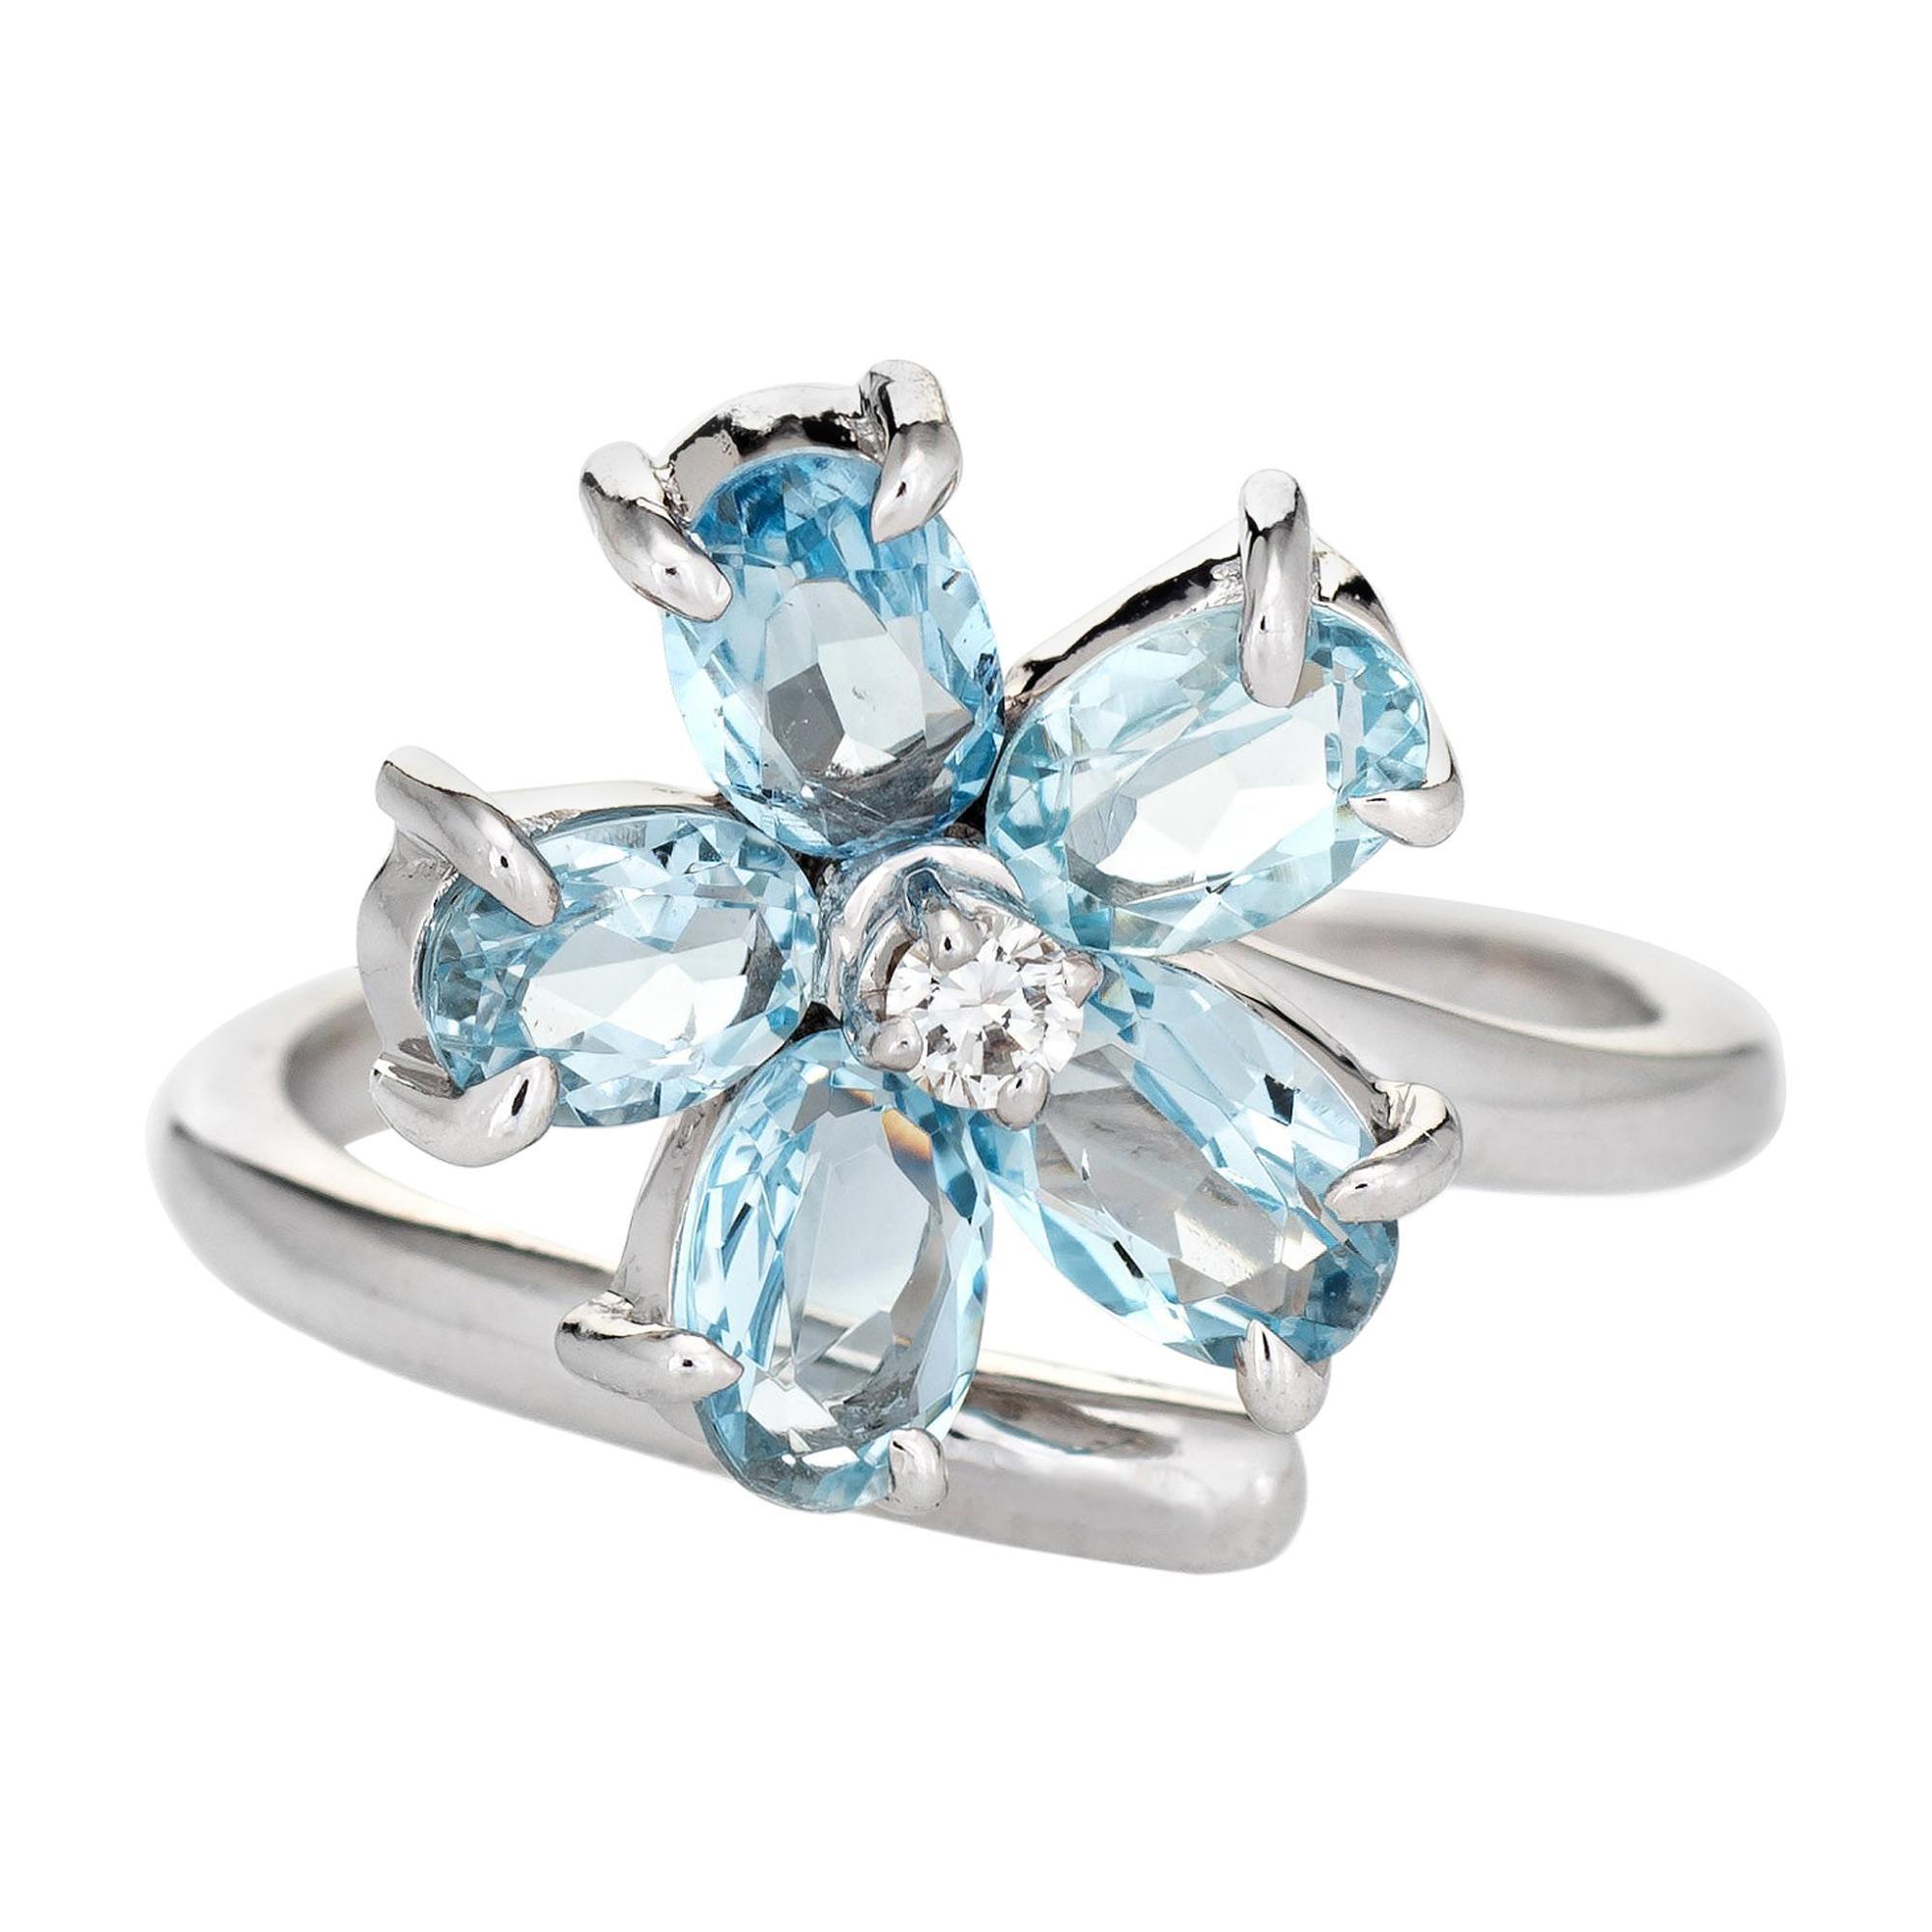 Aquamarine Diamond Flower Ring Estate 14k White Gold Fine Vintage Jewelry